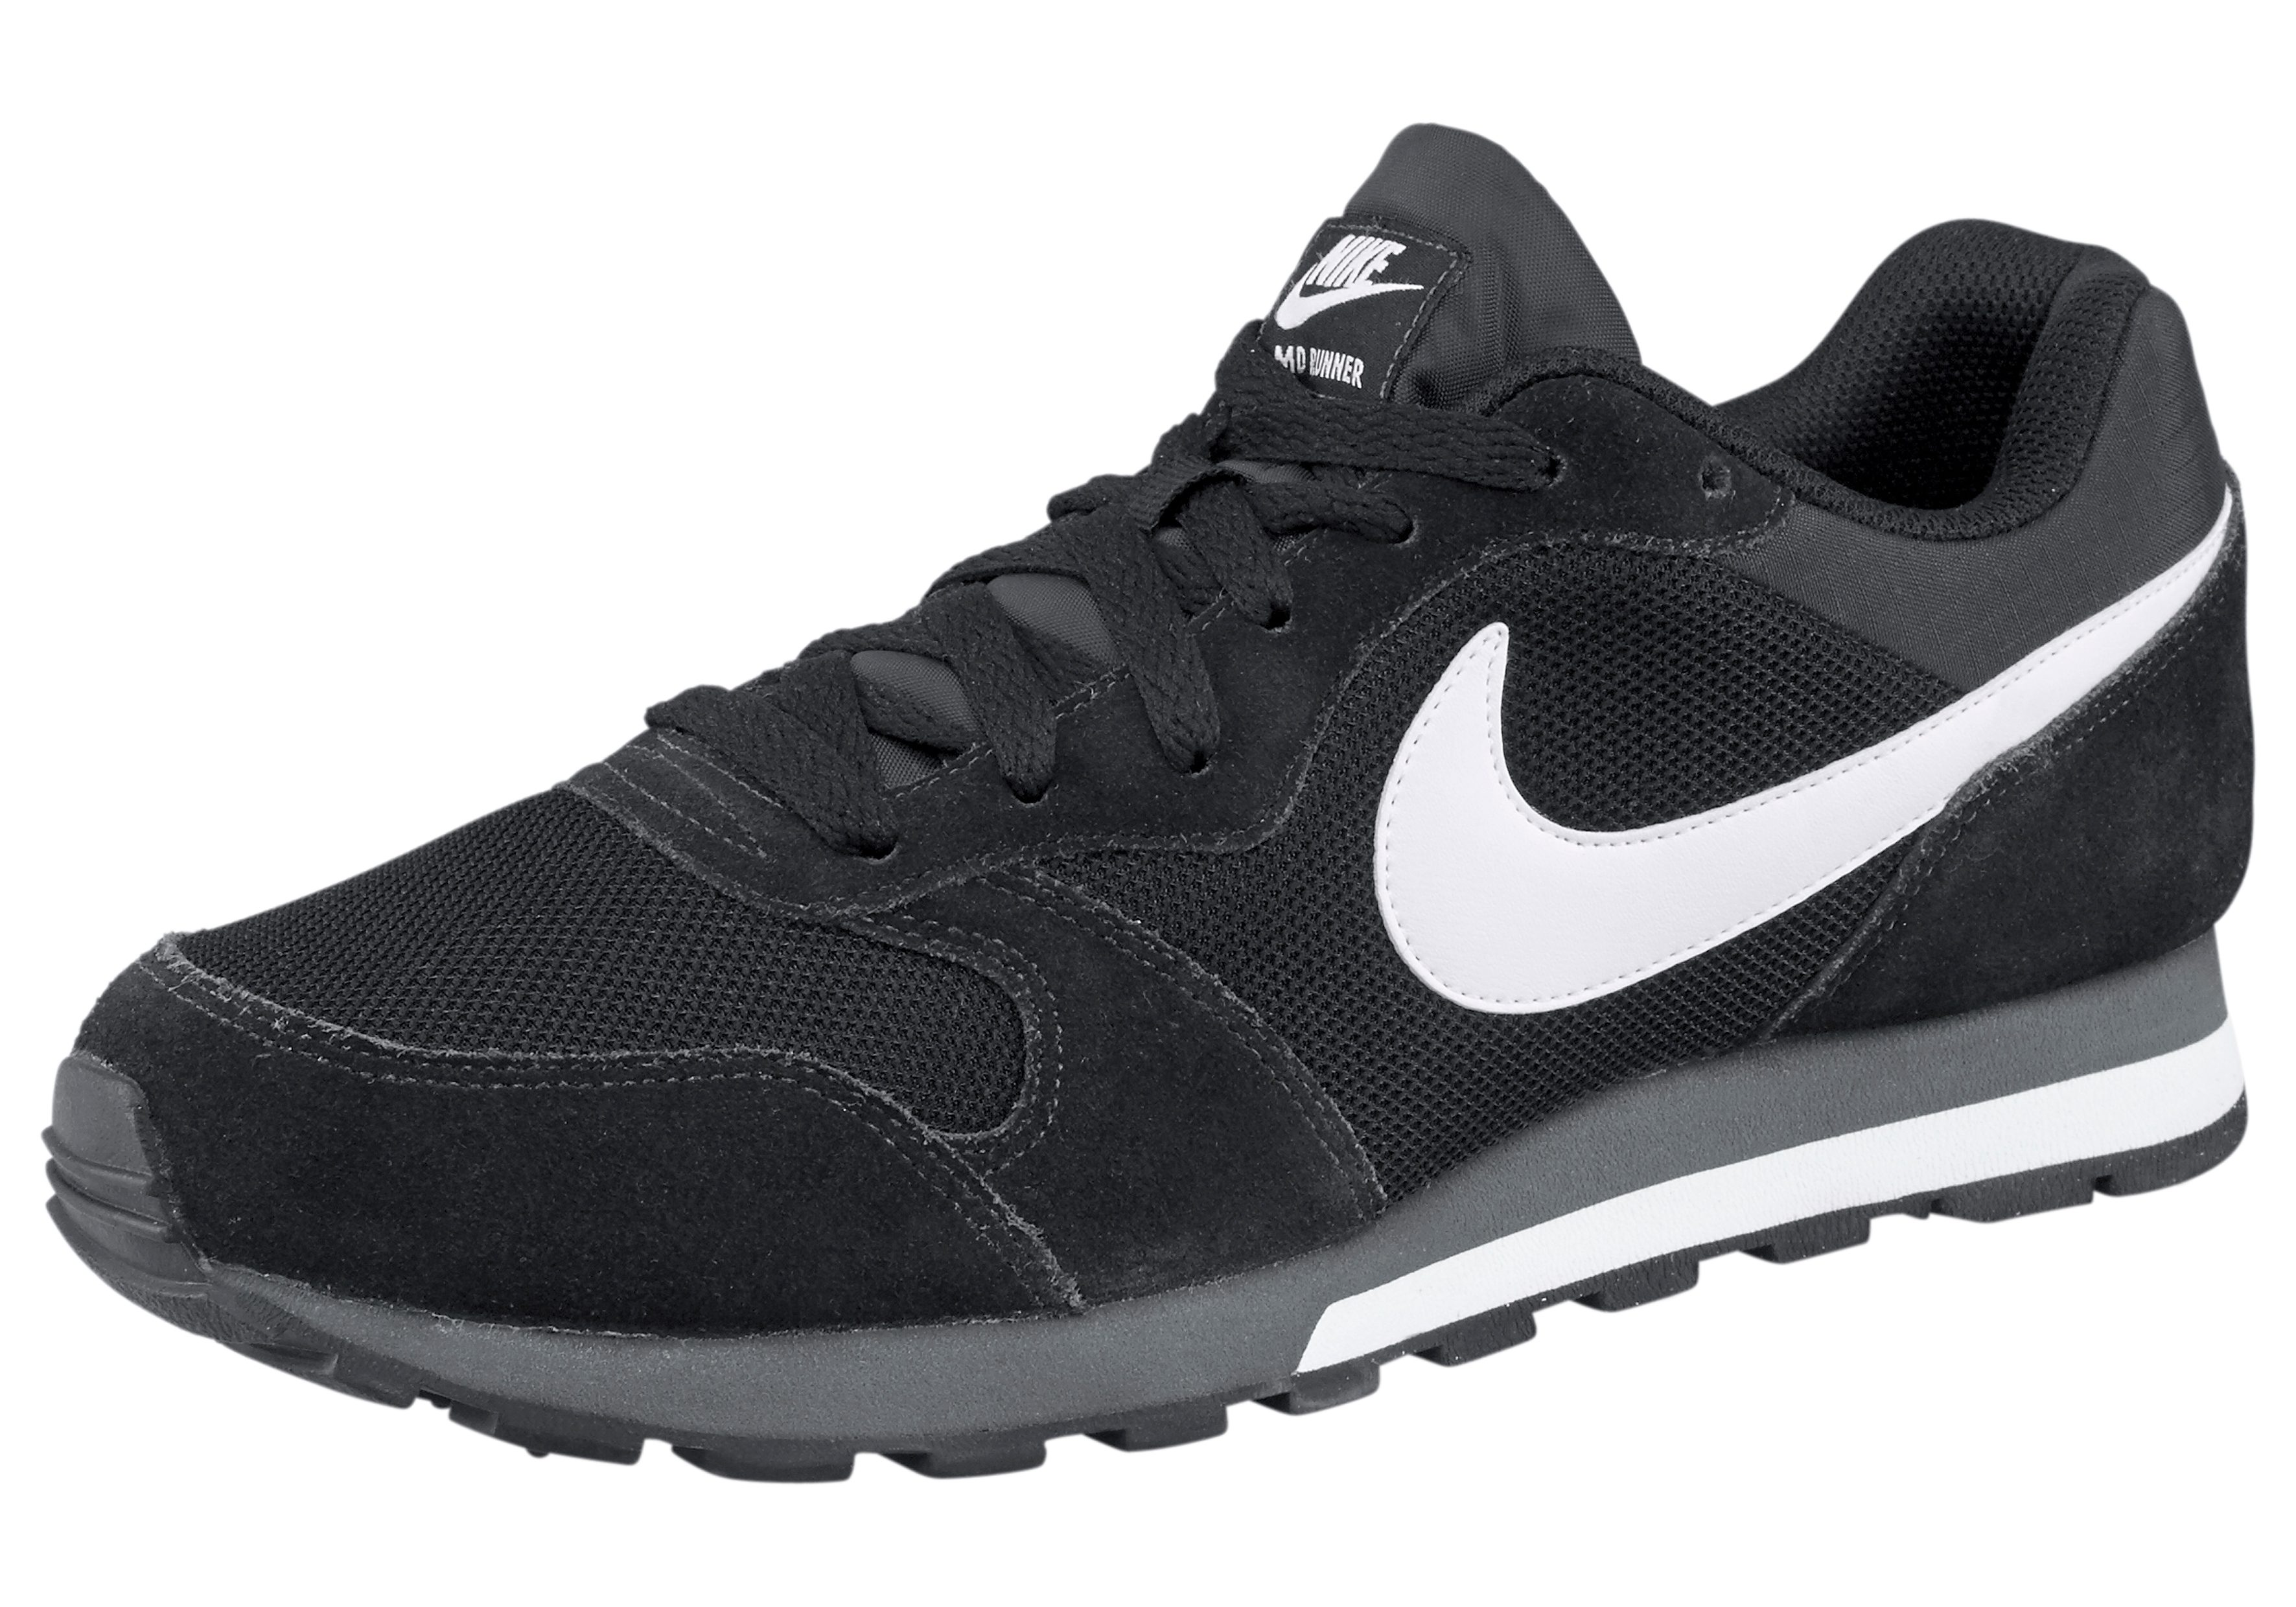 NIKE Runner 2 Herren Low Sneaker Grau Schuhe, Gr | real